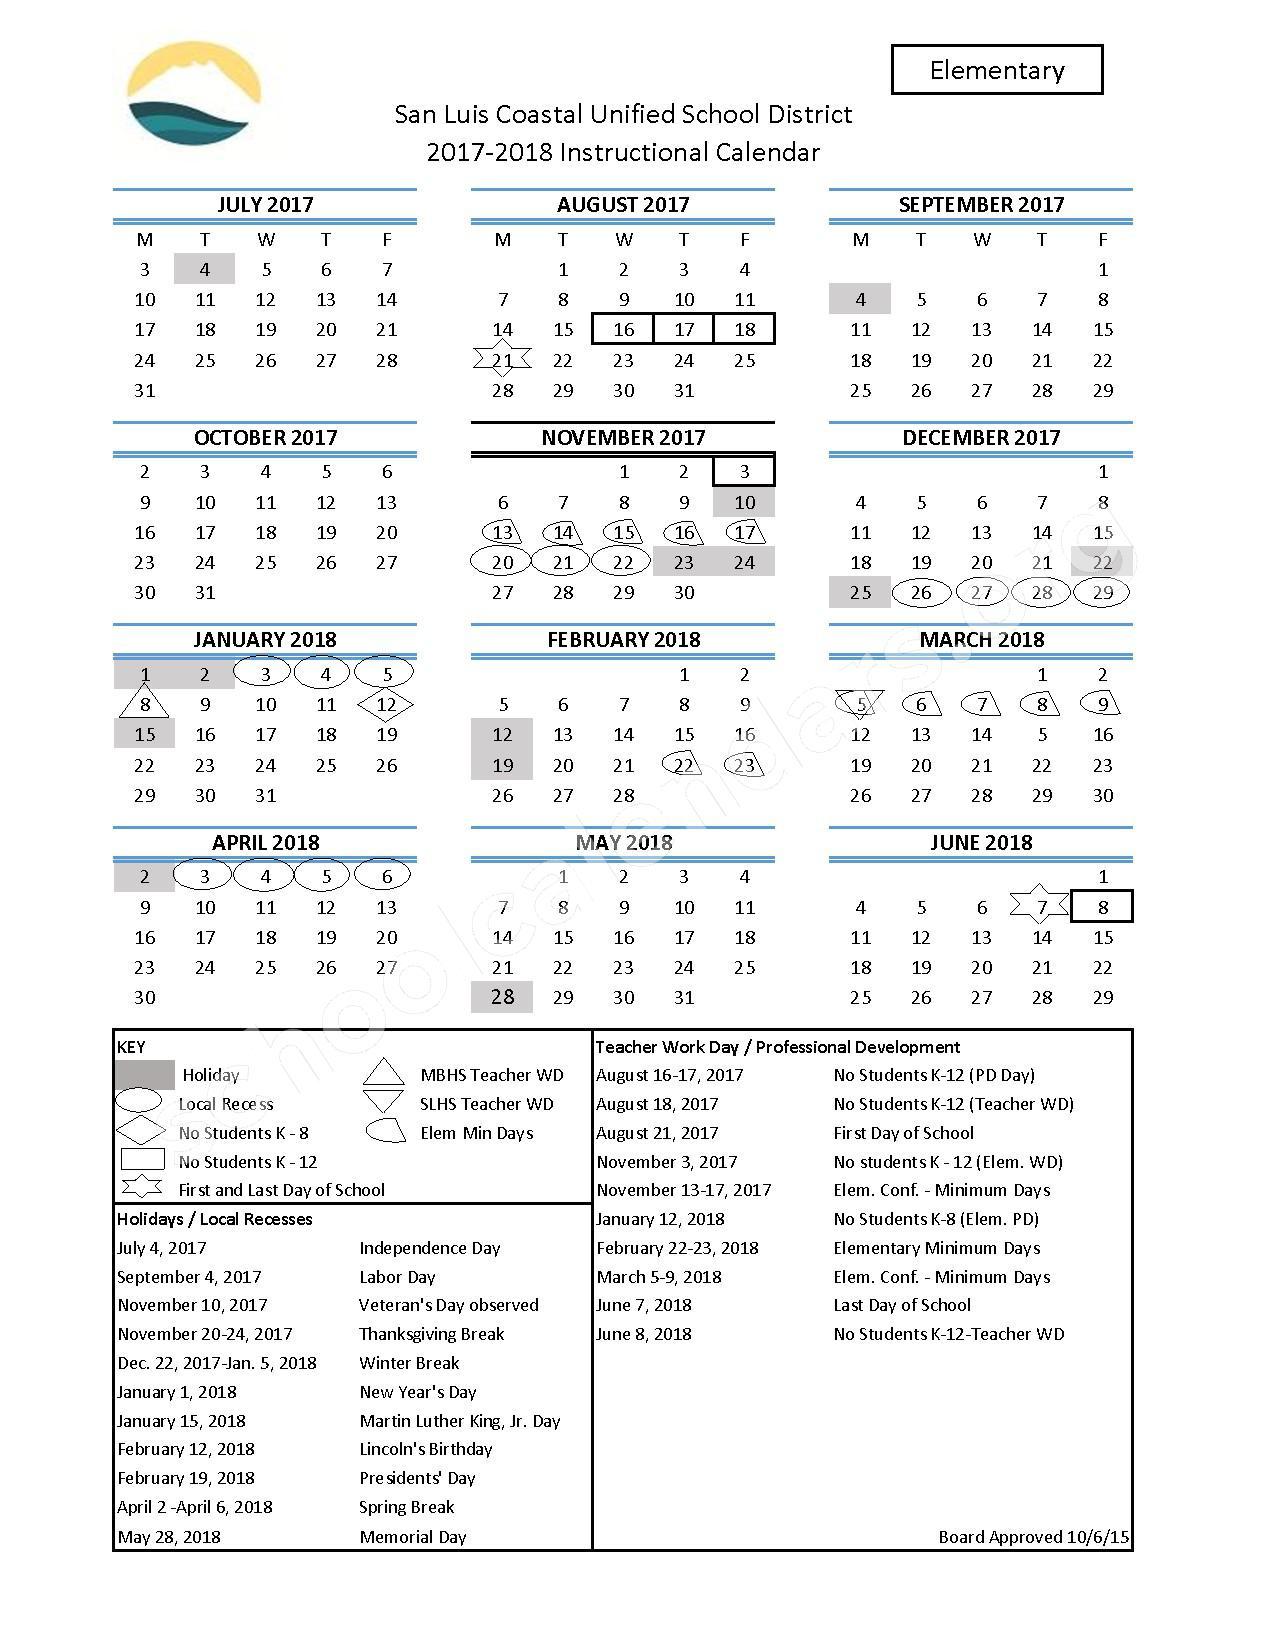 2017 - 2018 Elementary School Calendar – San Luis Coastal Unified School District – page 1